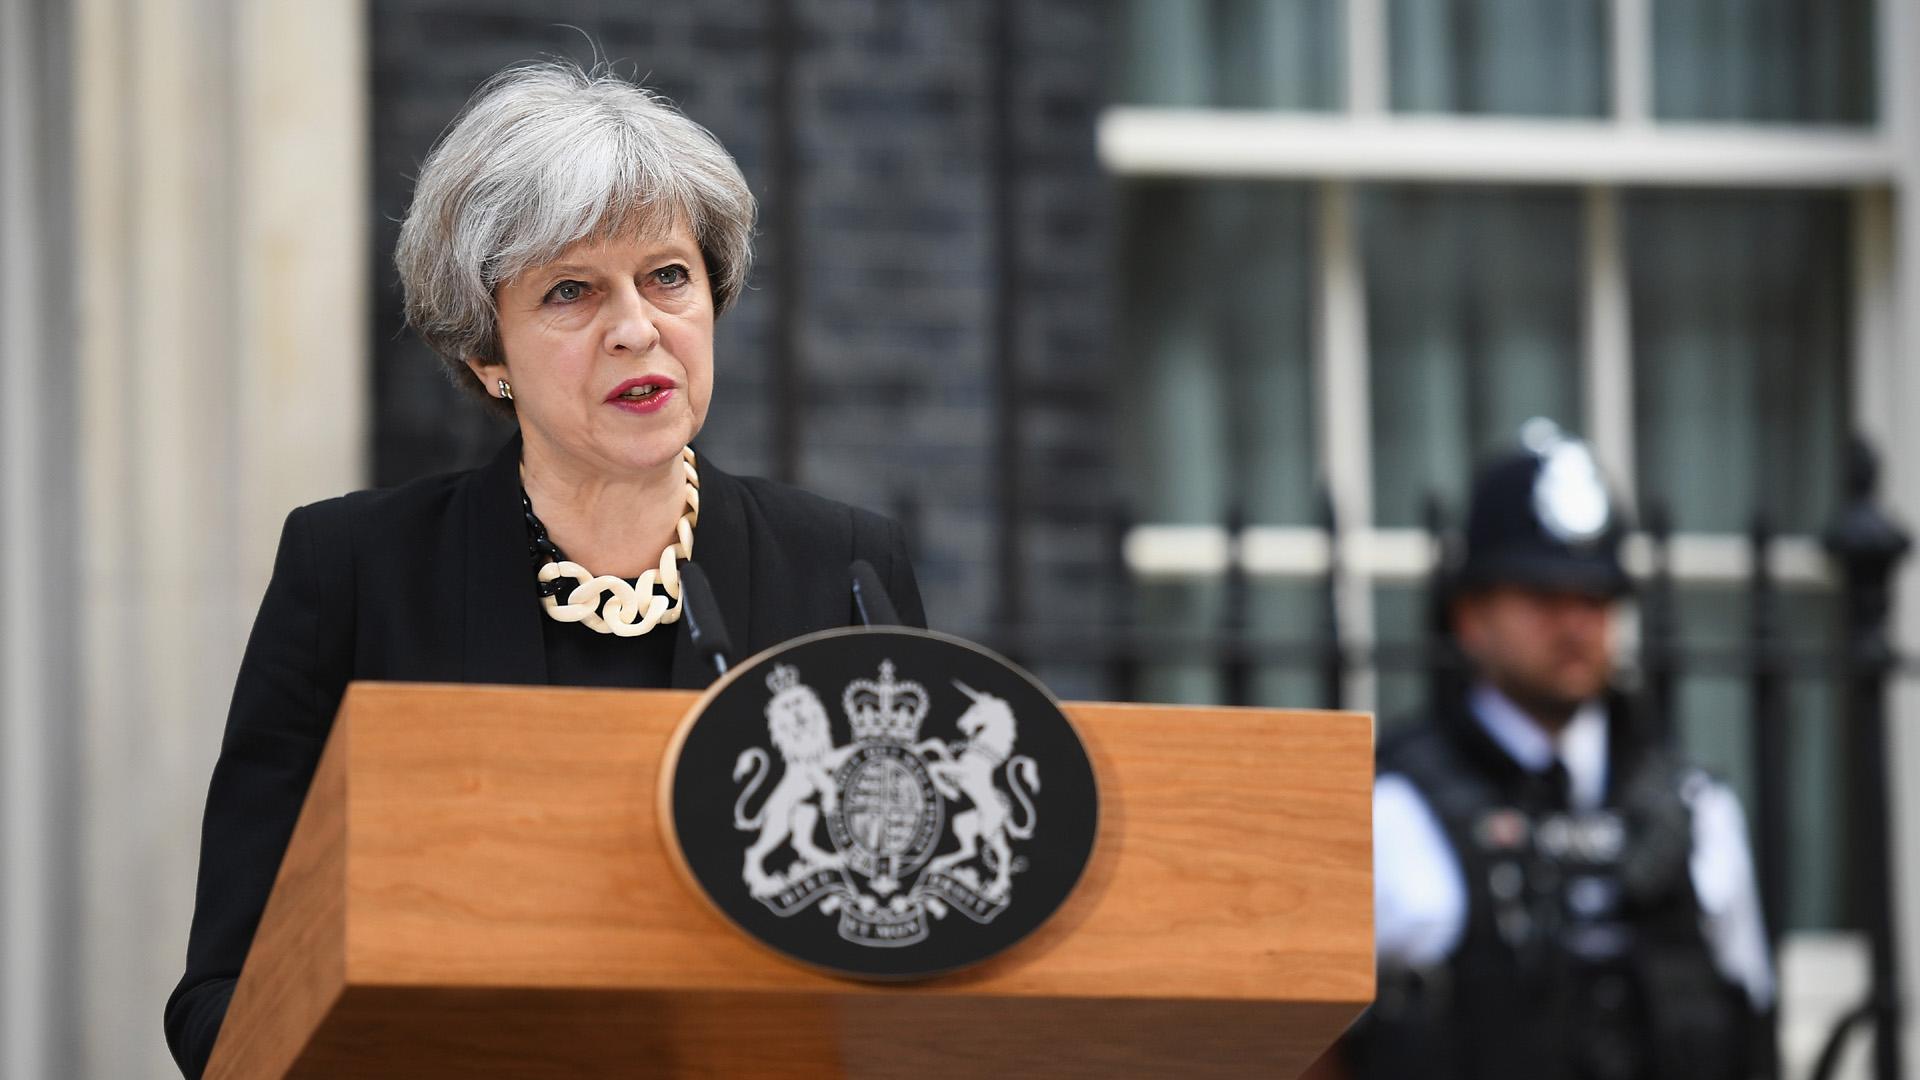 British Prime Minister Theresa May June 4, London Attack presser,90184888-159532